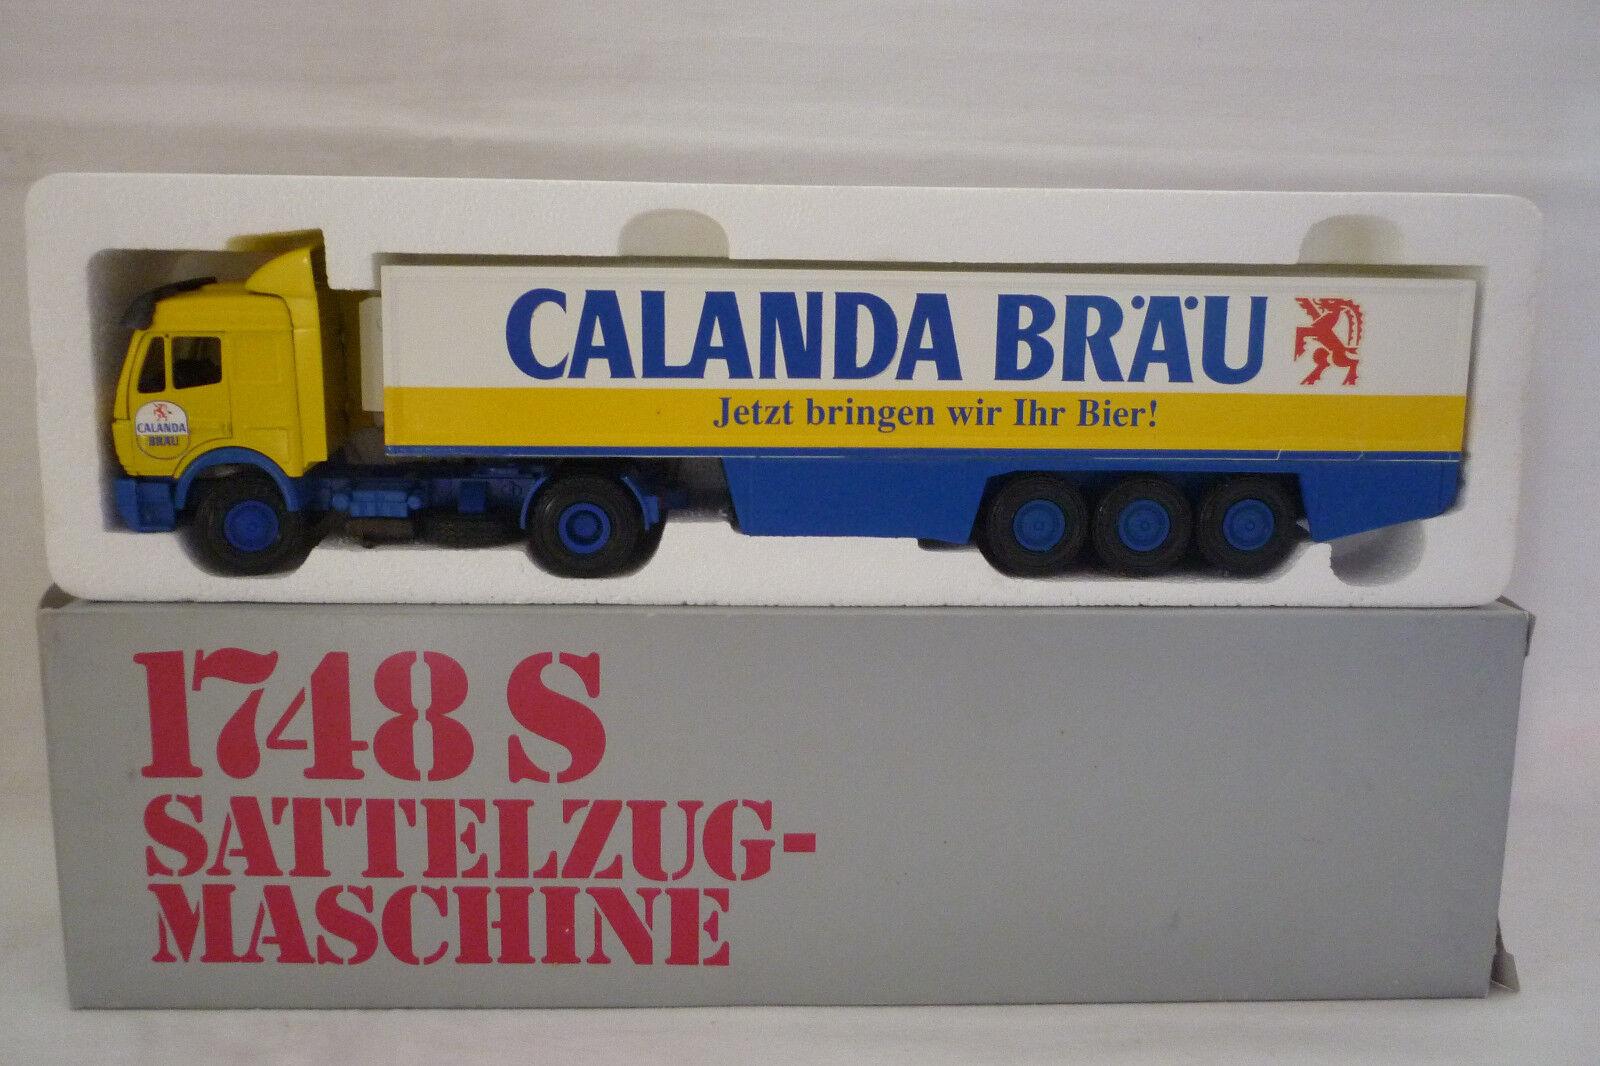 Nzg - Metal Model - Mercedes Benz Calanda Bräu Lorry 1 43 Ovp 7.bm-236